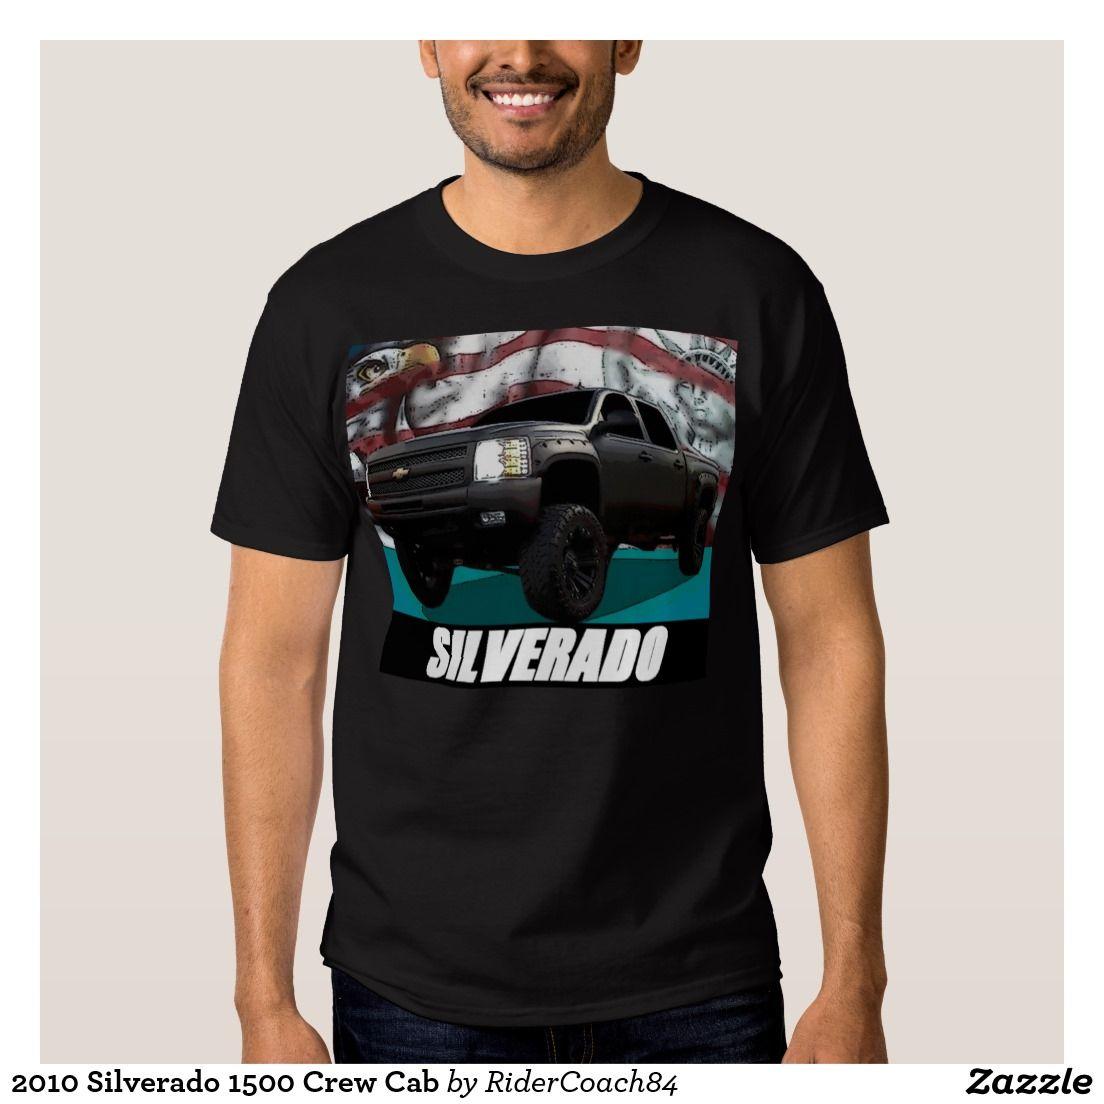 2010 Silverado 1500 Crew Cab T-Shirt